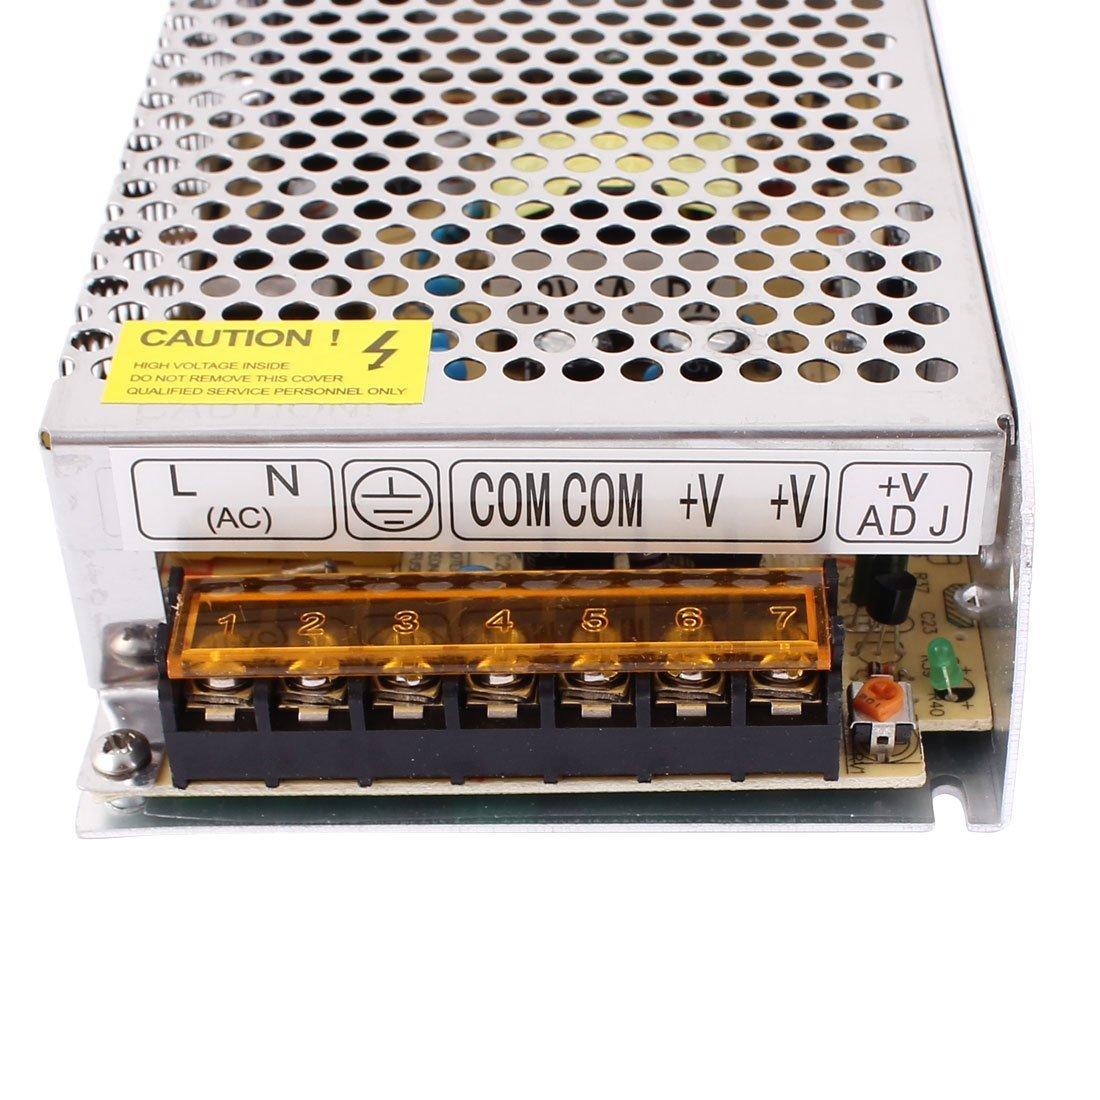 Redrex DC 12V 5A Universal Regul/ó la Unidad de Potencia Adaptador Transformador Para LED Luces de Tira CCTV Sistema de Seguridad Inform/ática del Proyecto